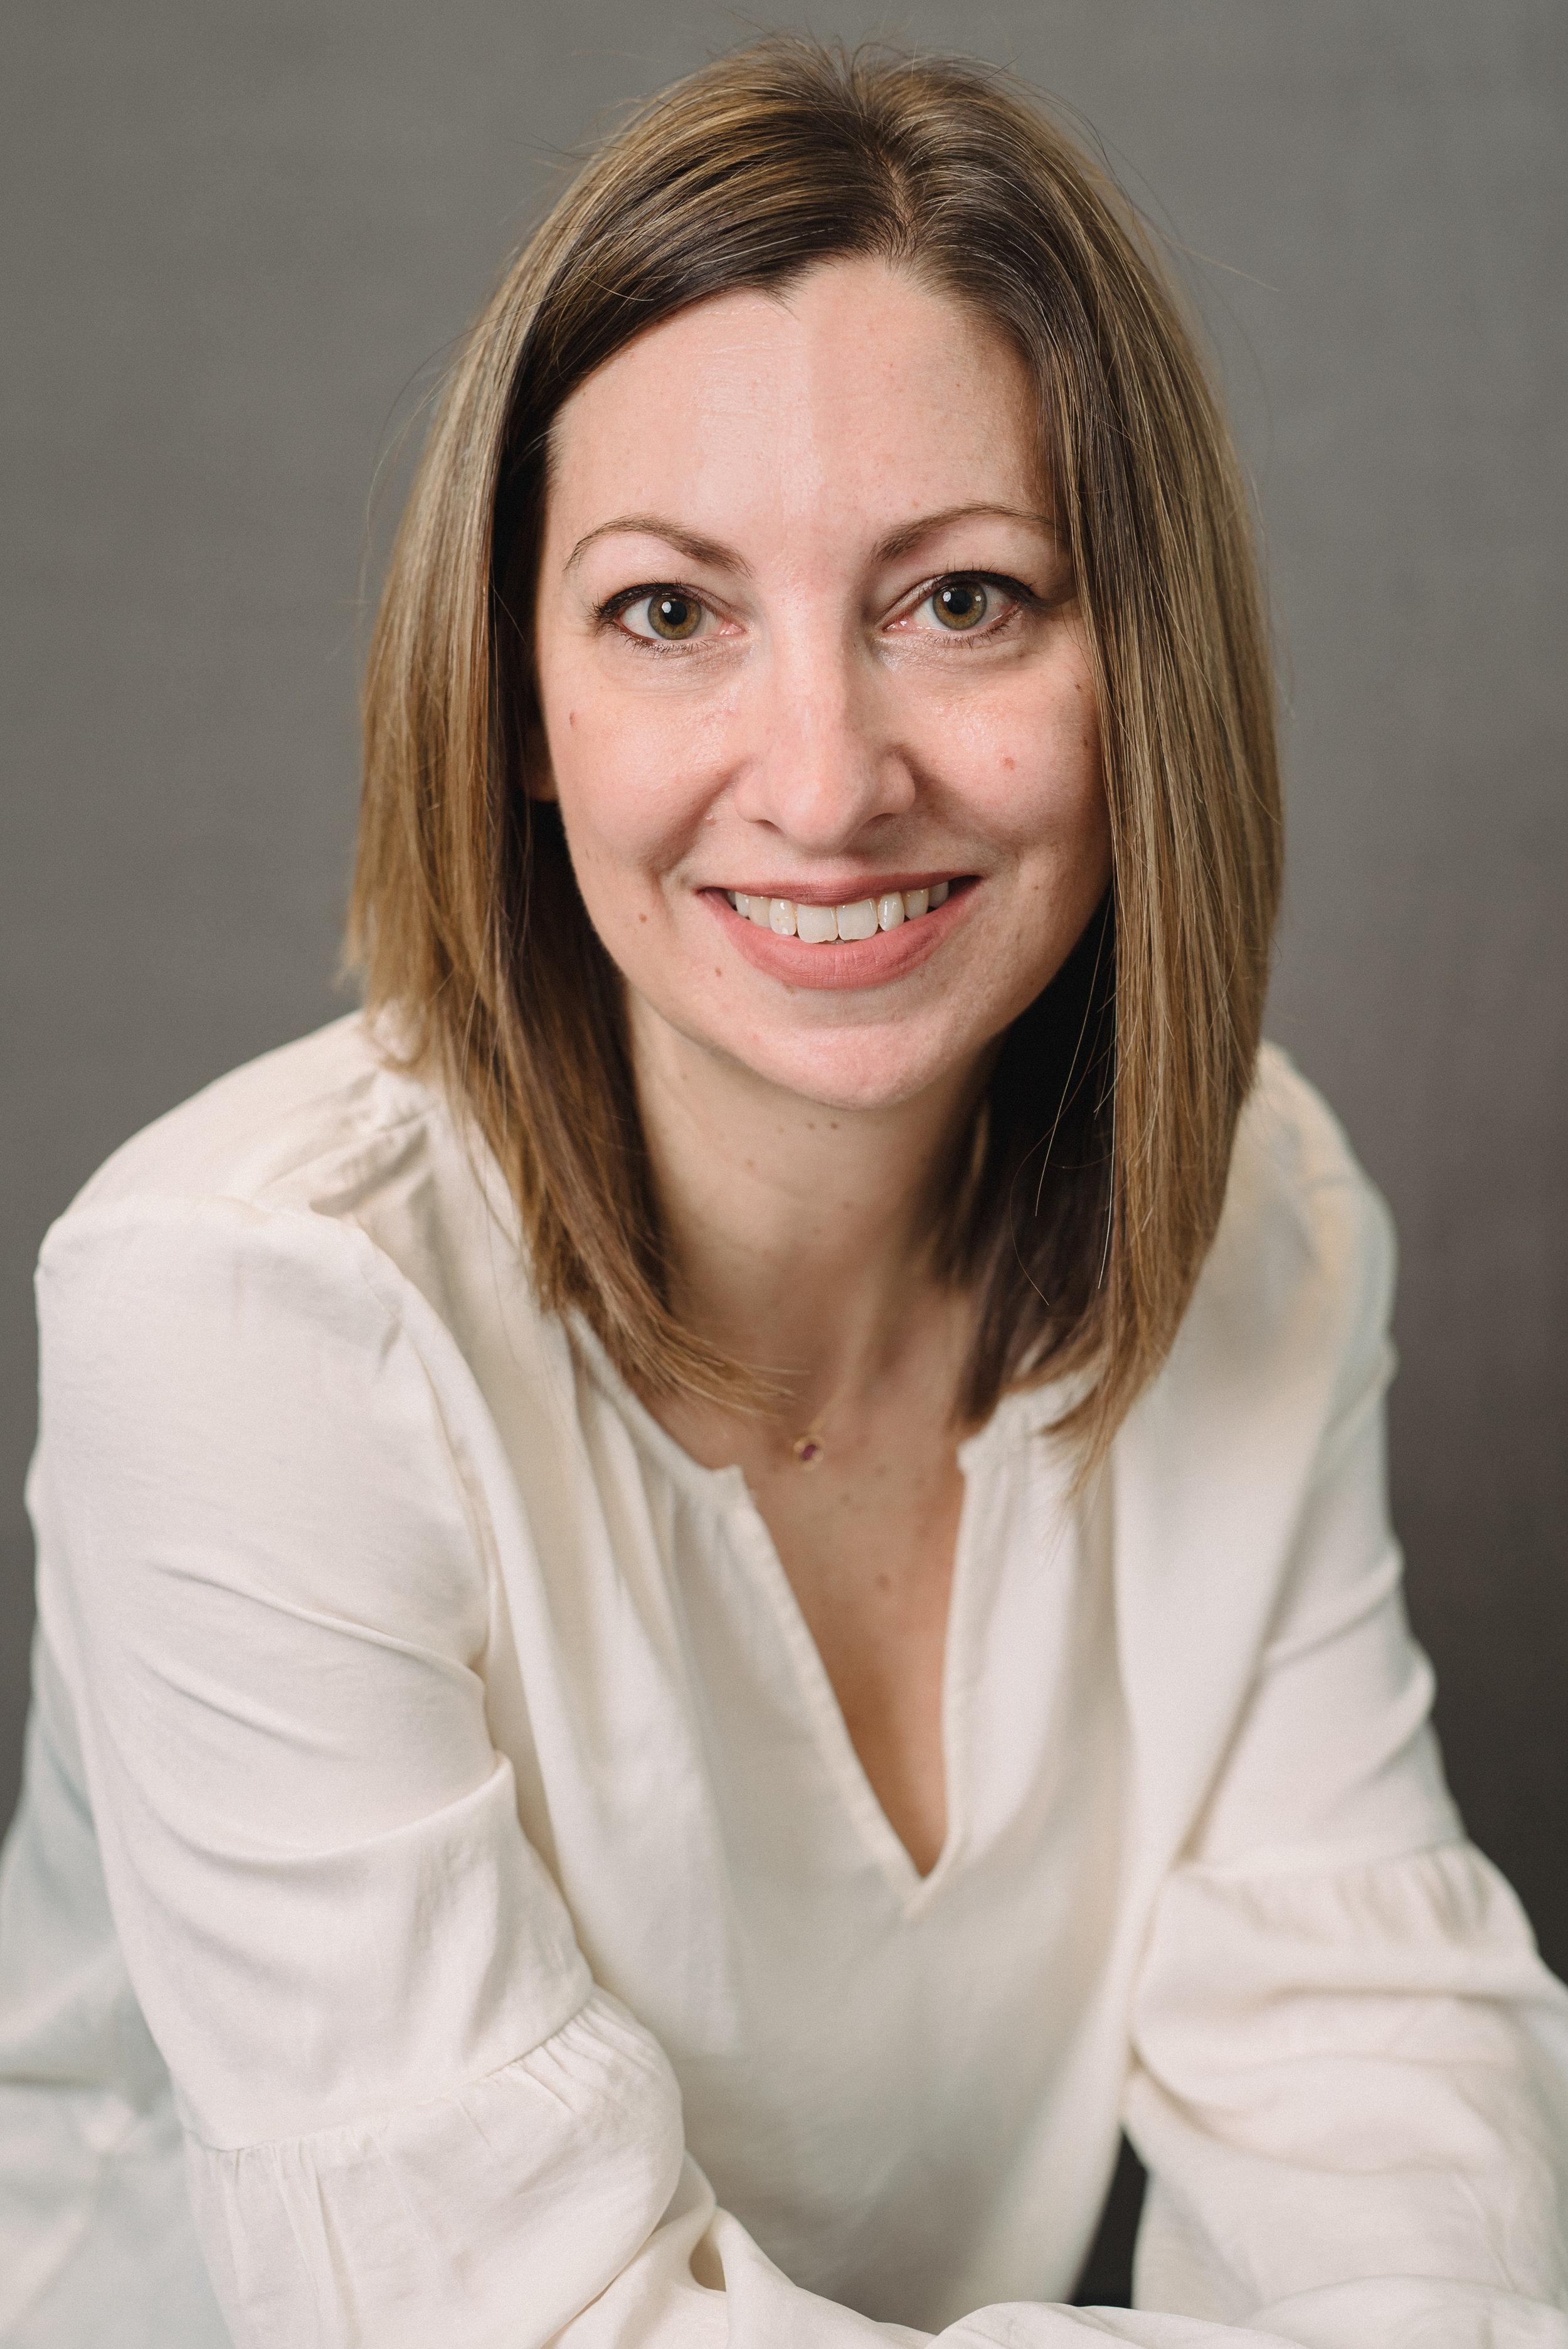 Erin Dougherty, LCPC